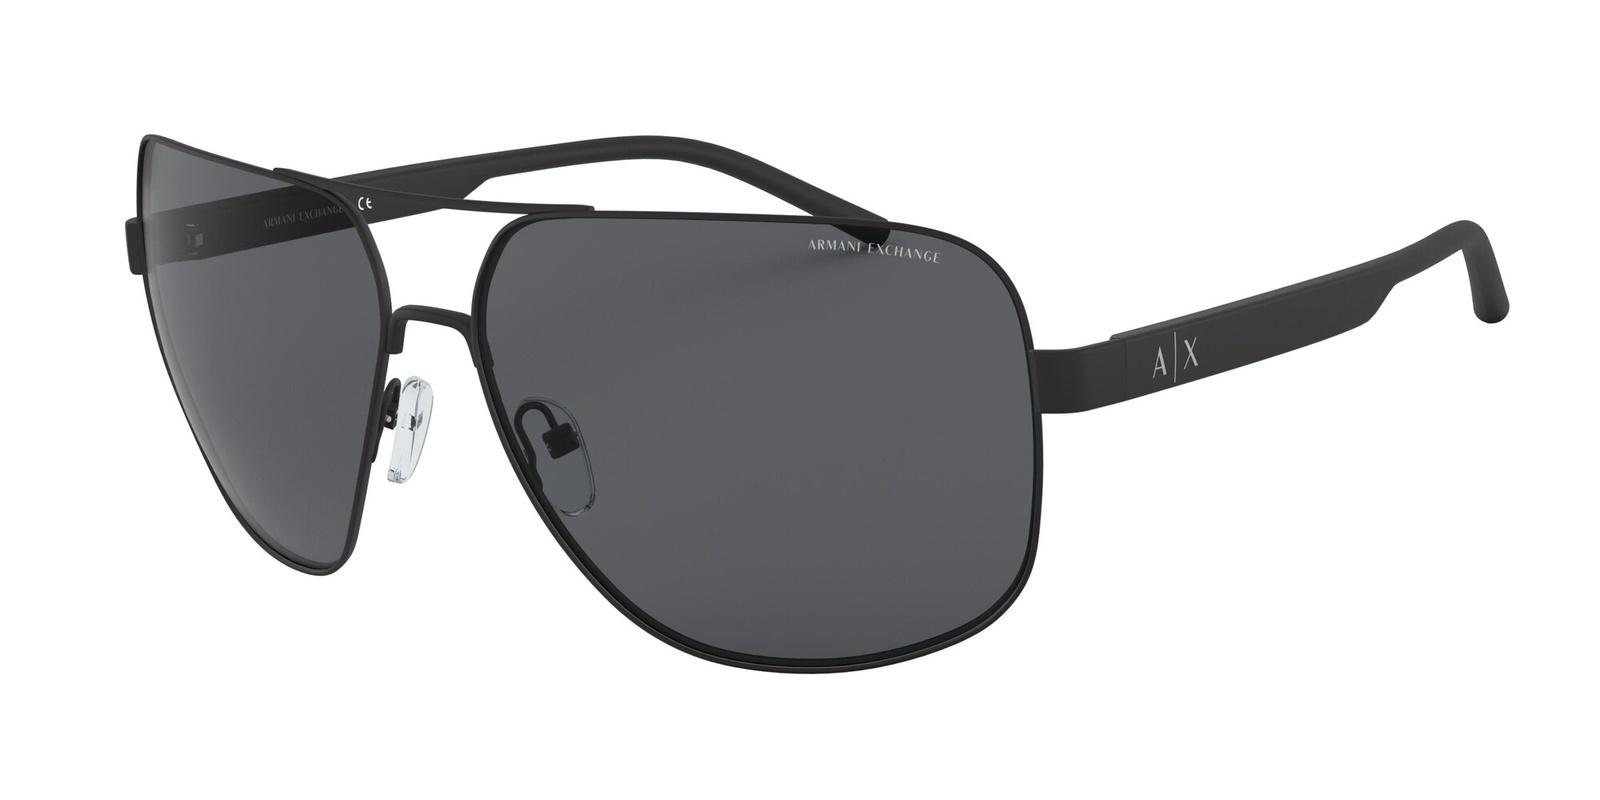 Armani Exchange AX2030S sunglasses